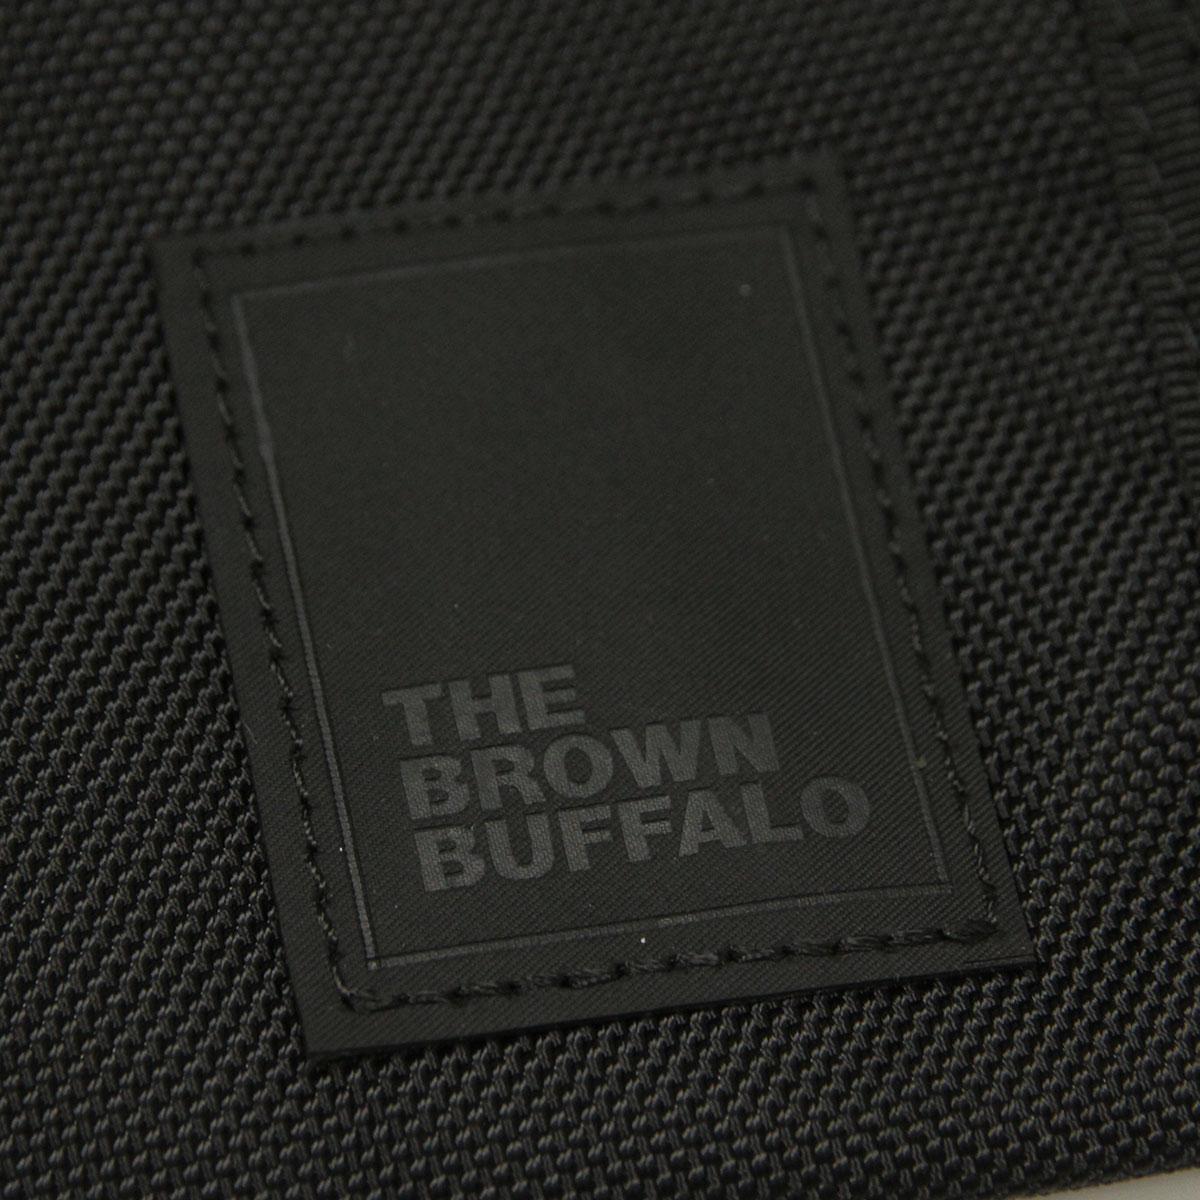 the_brown_buffalo_1